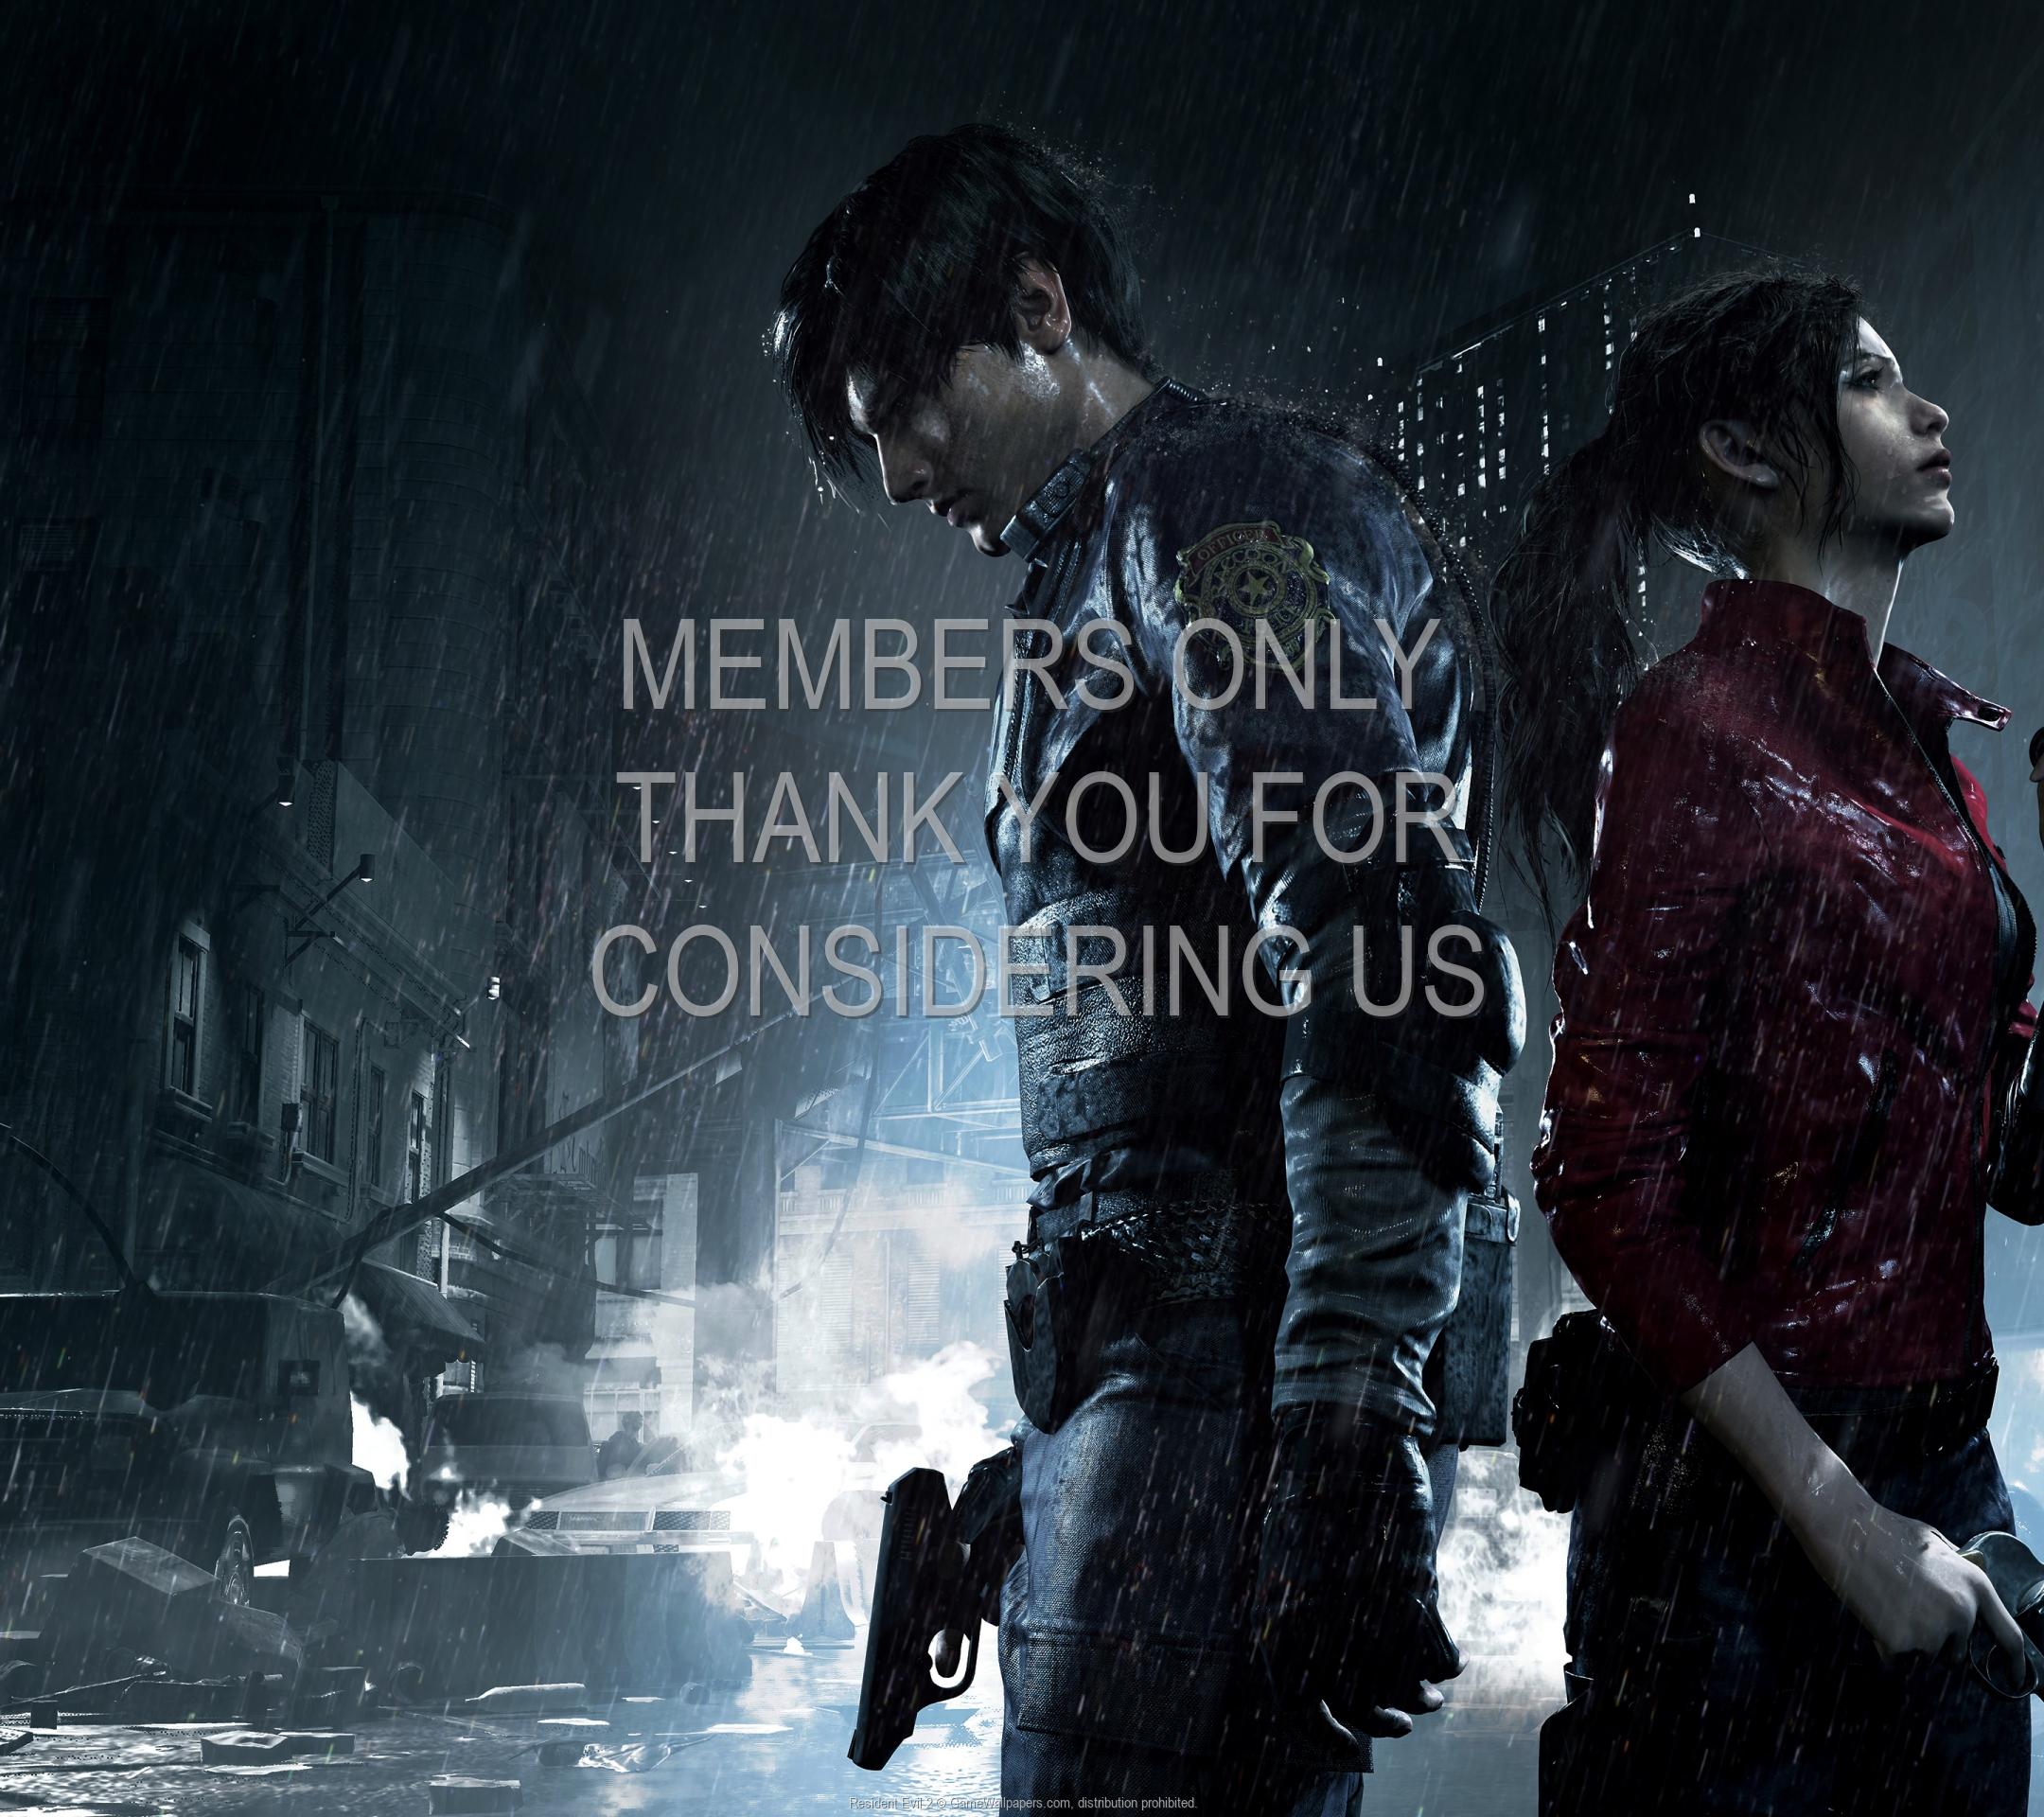 Resident Evil 2 1920x1080 Mobile wallpaper or background 01